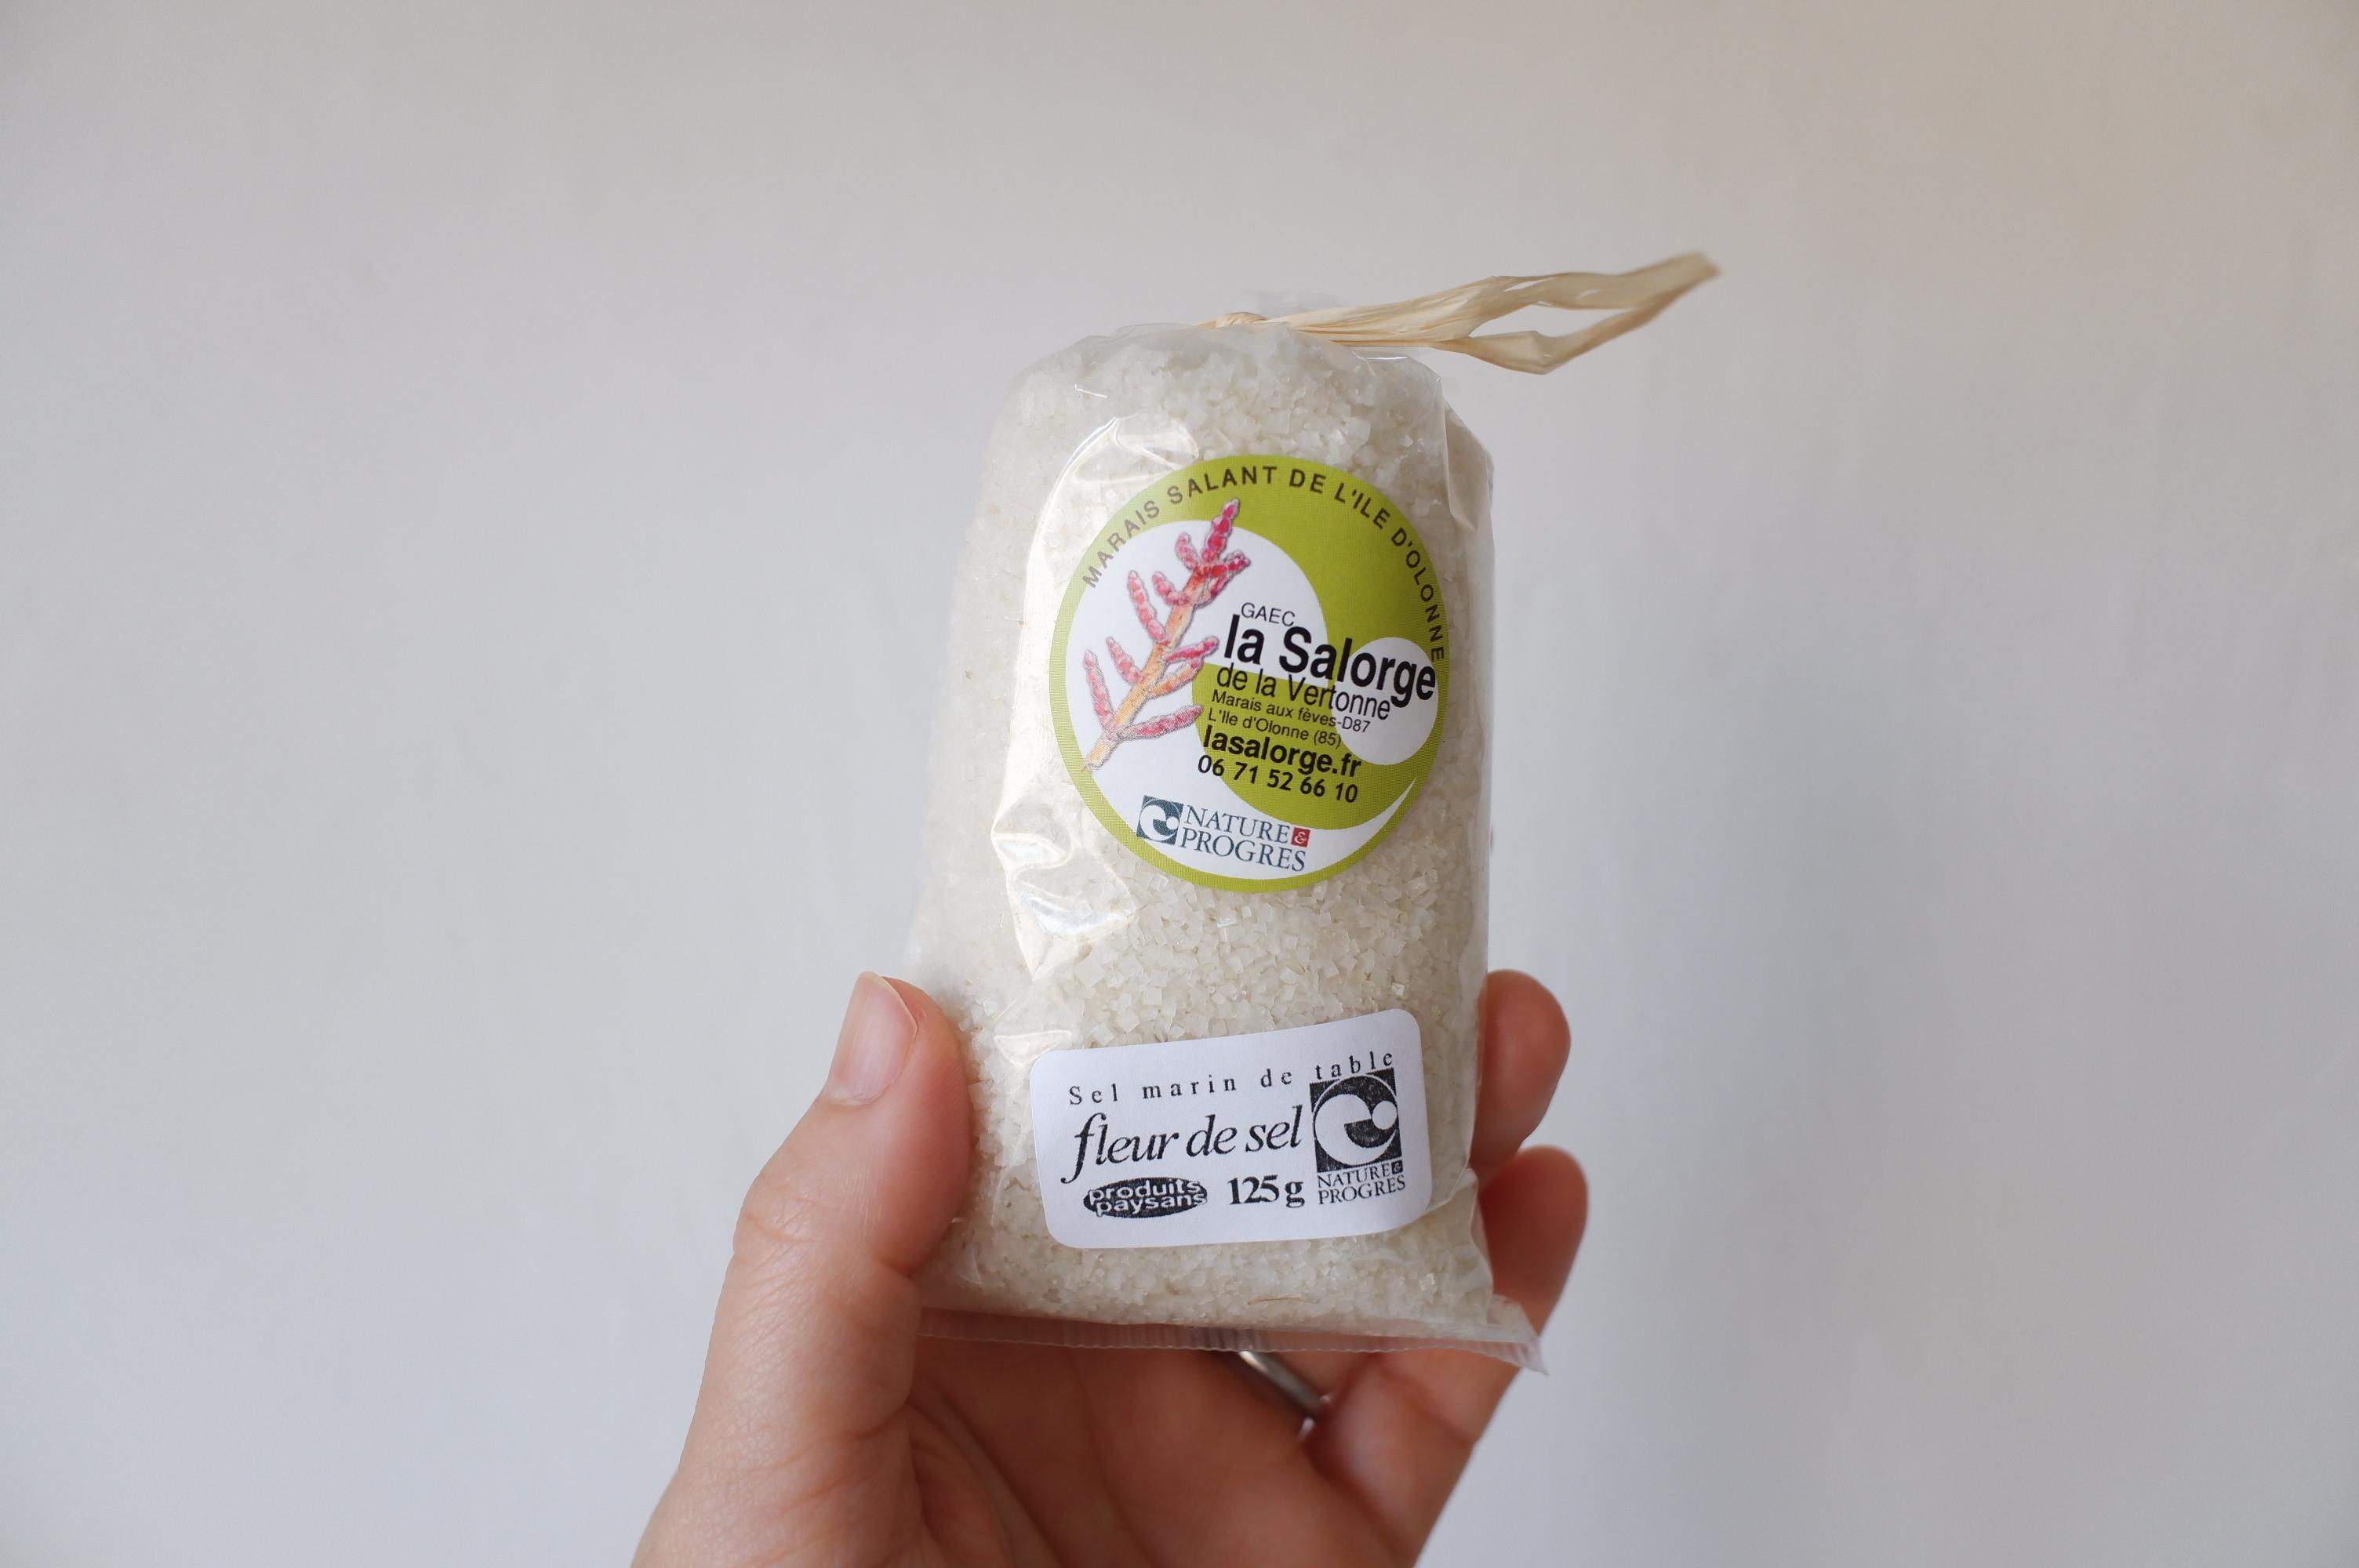 La Salorge de la Vertonne  ヴェルトンヌの塩の花  125g